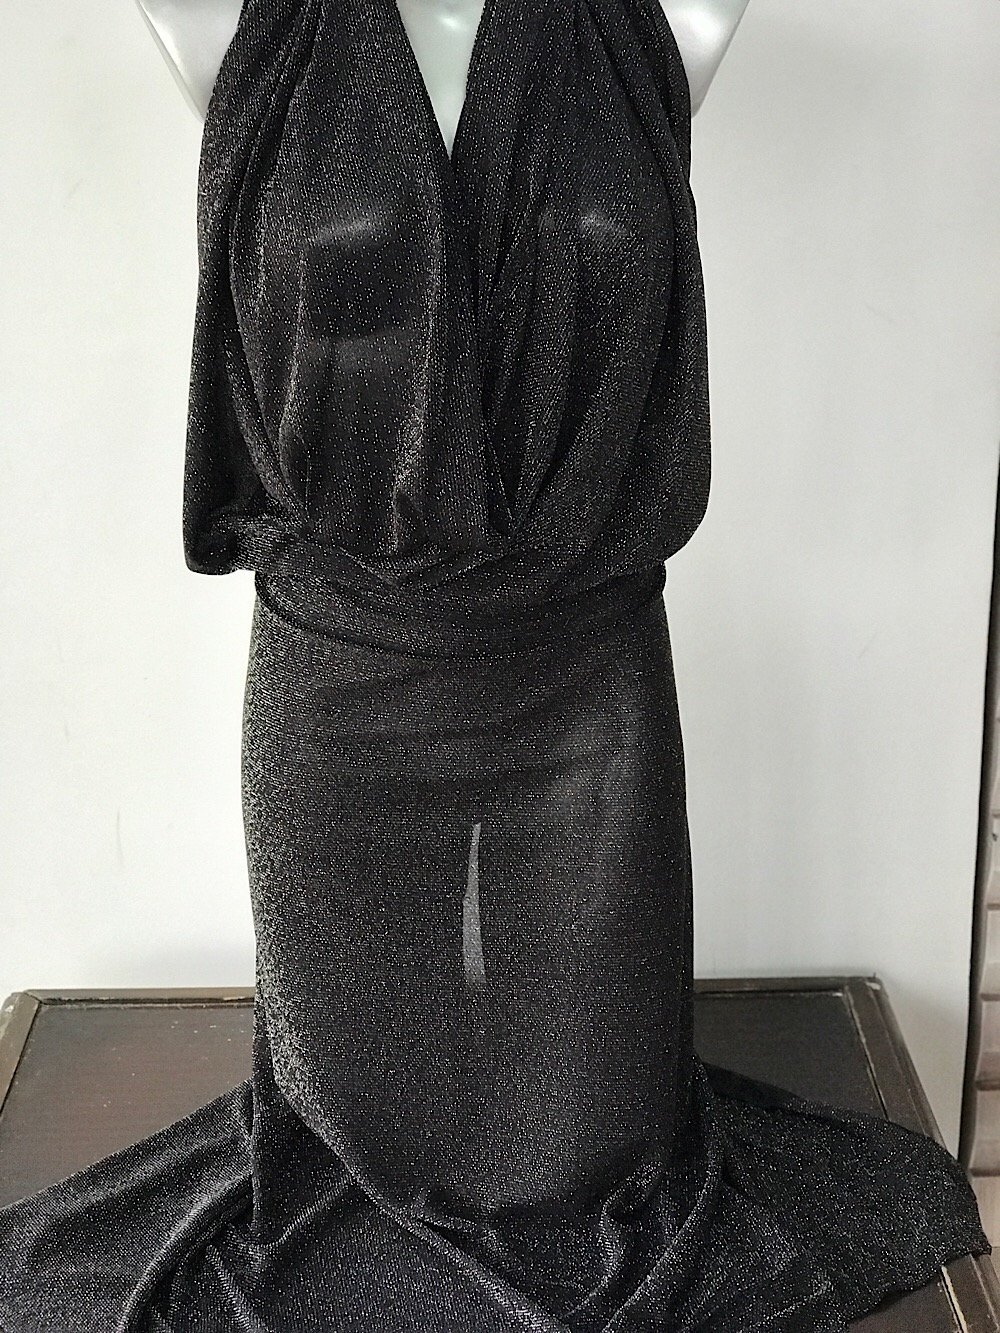 Silver on black metallic thread lurex knitted jersey fabric 150cm wide 2 way stretch bridal clothing Festive season Christmas decotation